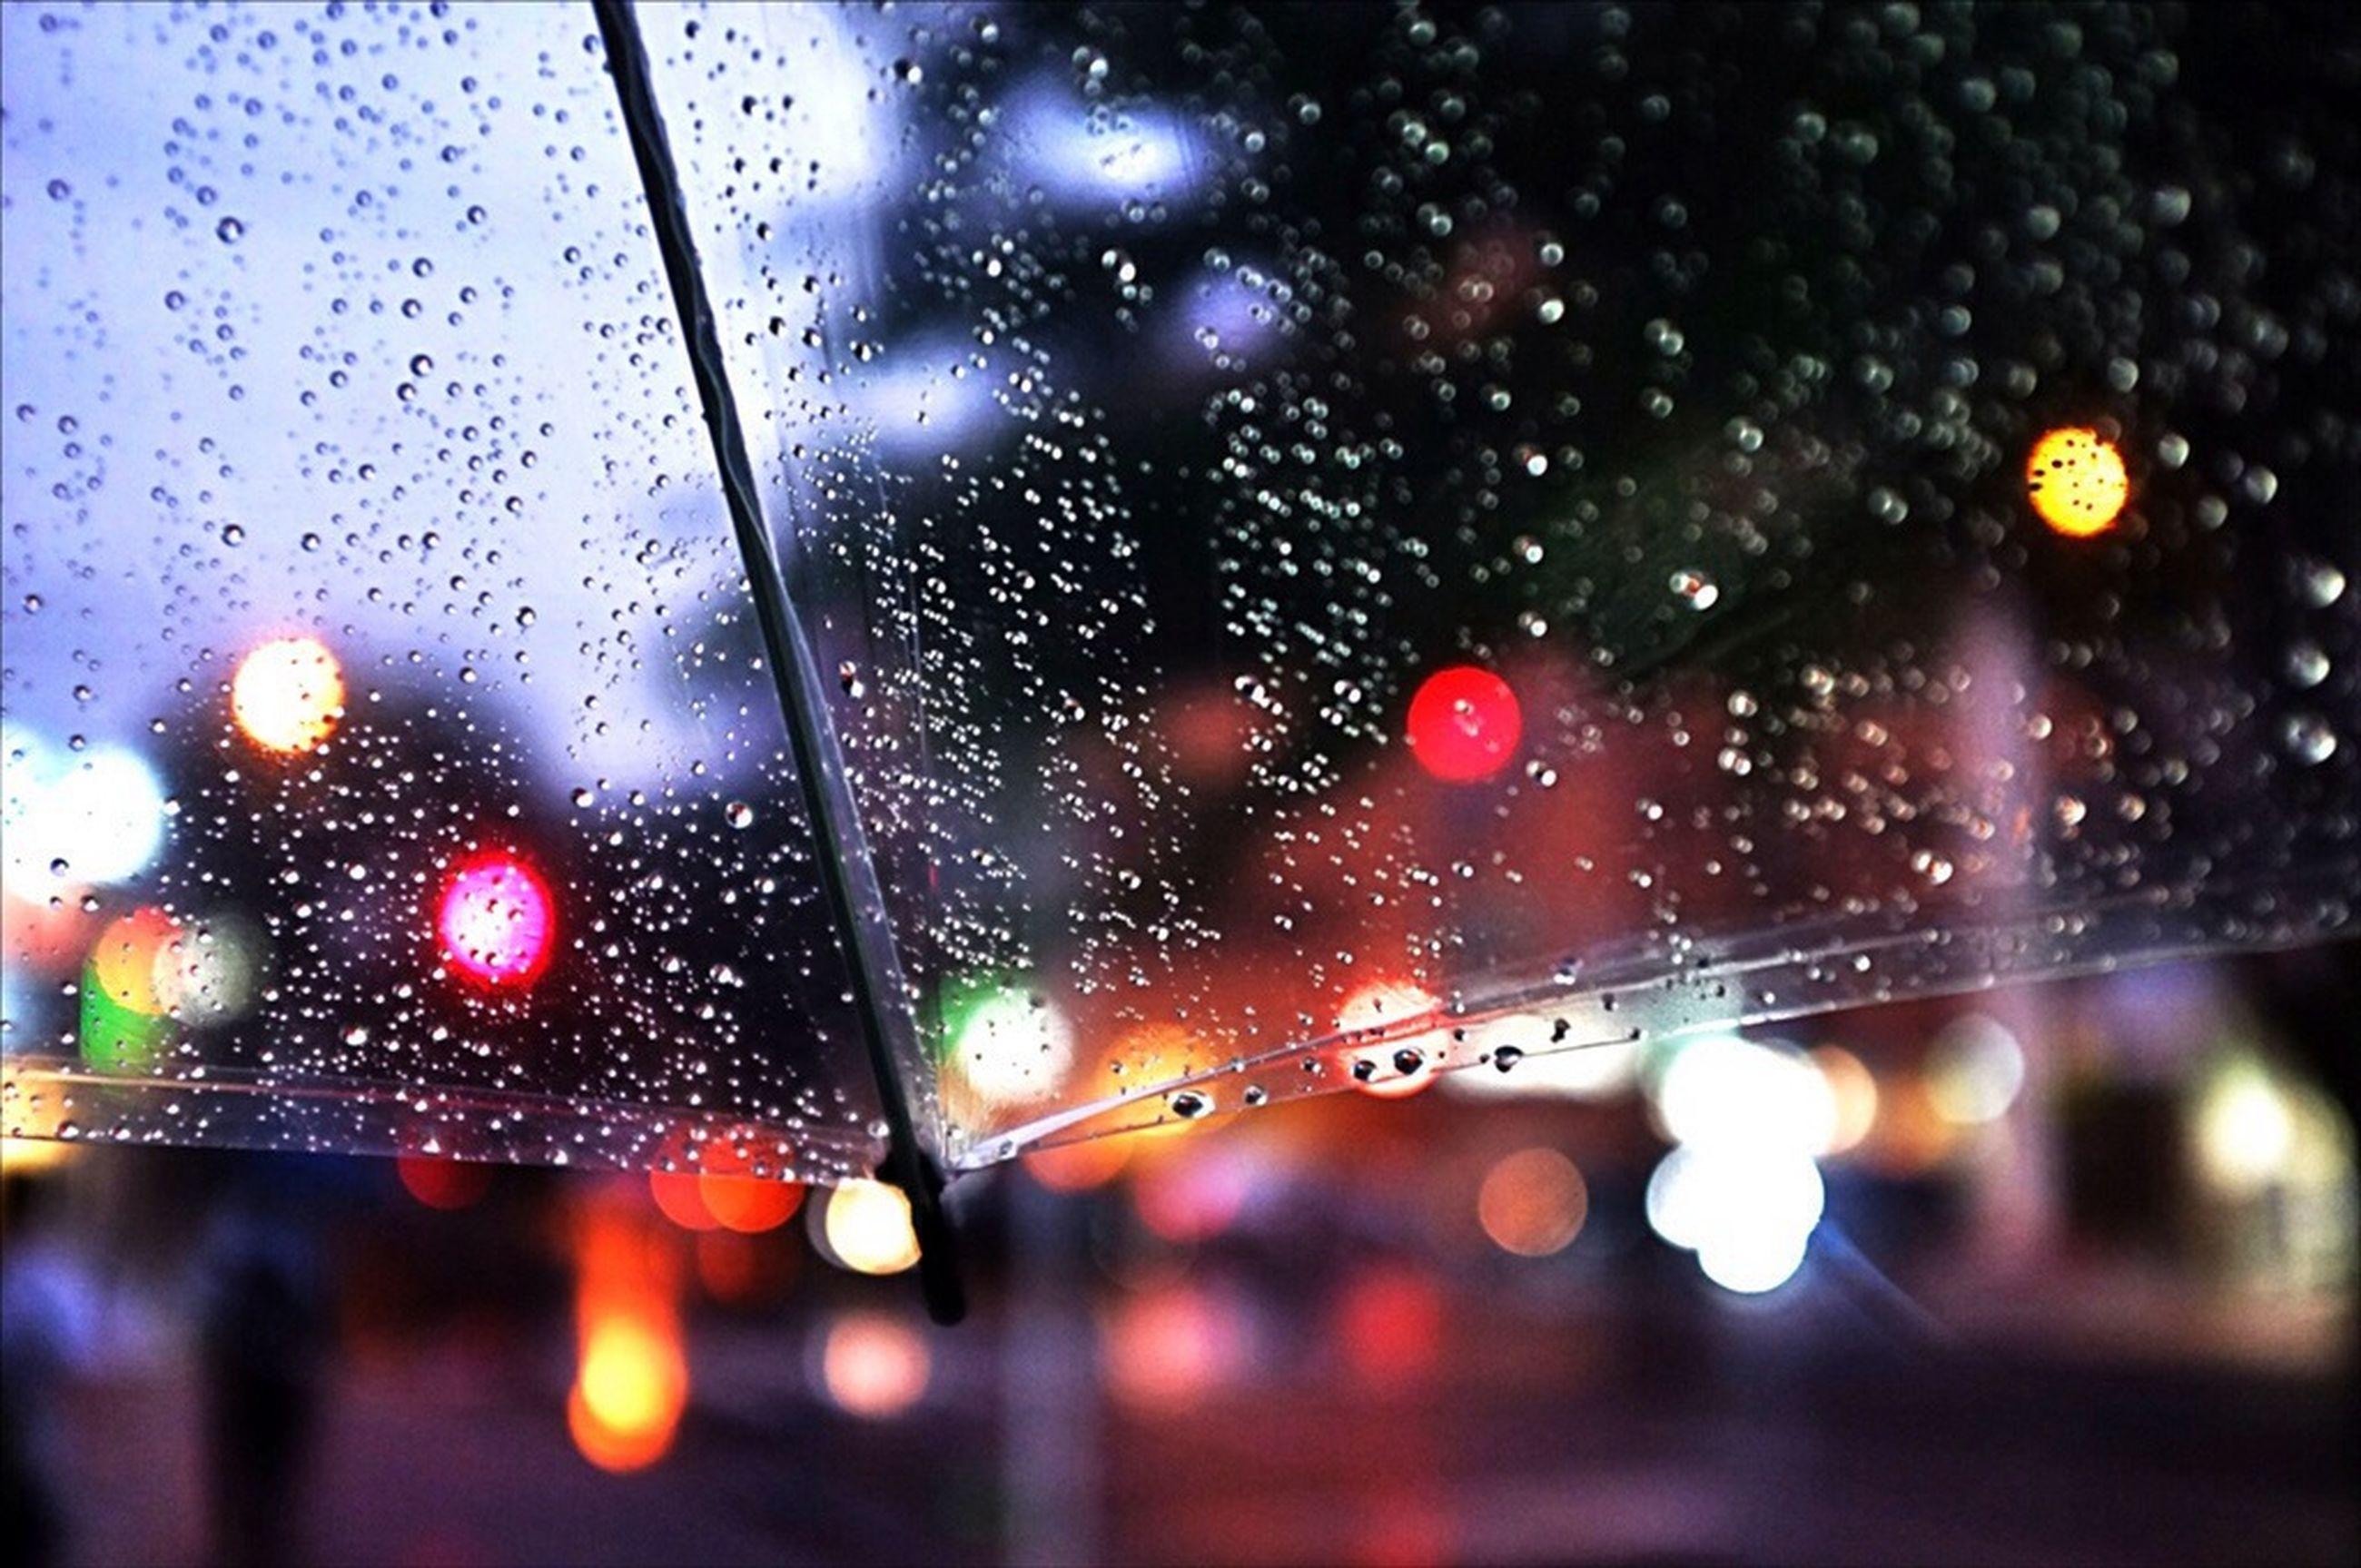 drop, wet, water, rain, transparent, focus on foreground, raindrop, window, glass - material, close-up, indoors, season, illuminated, water drop, weather, defocused, droplet, fragility, no people, car